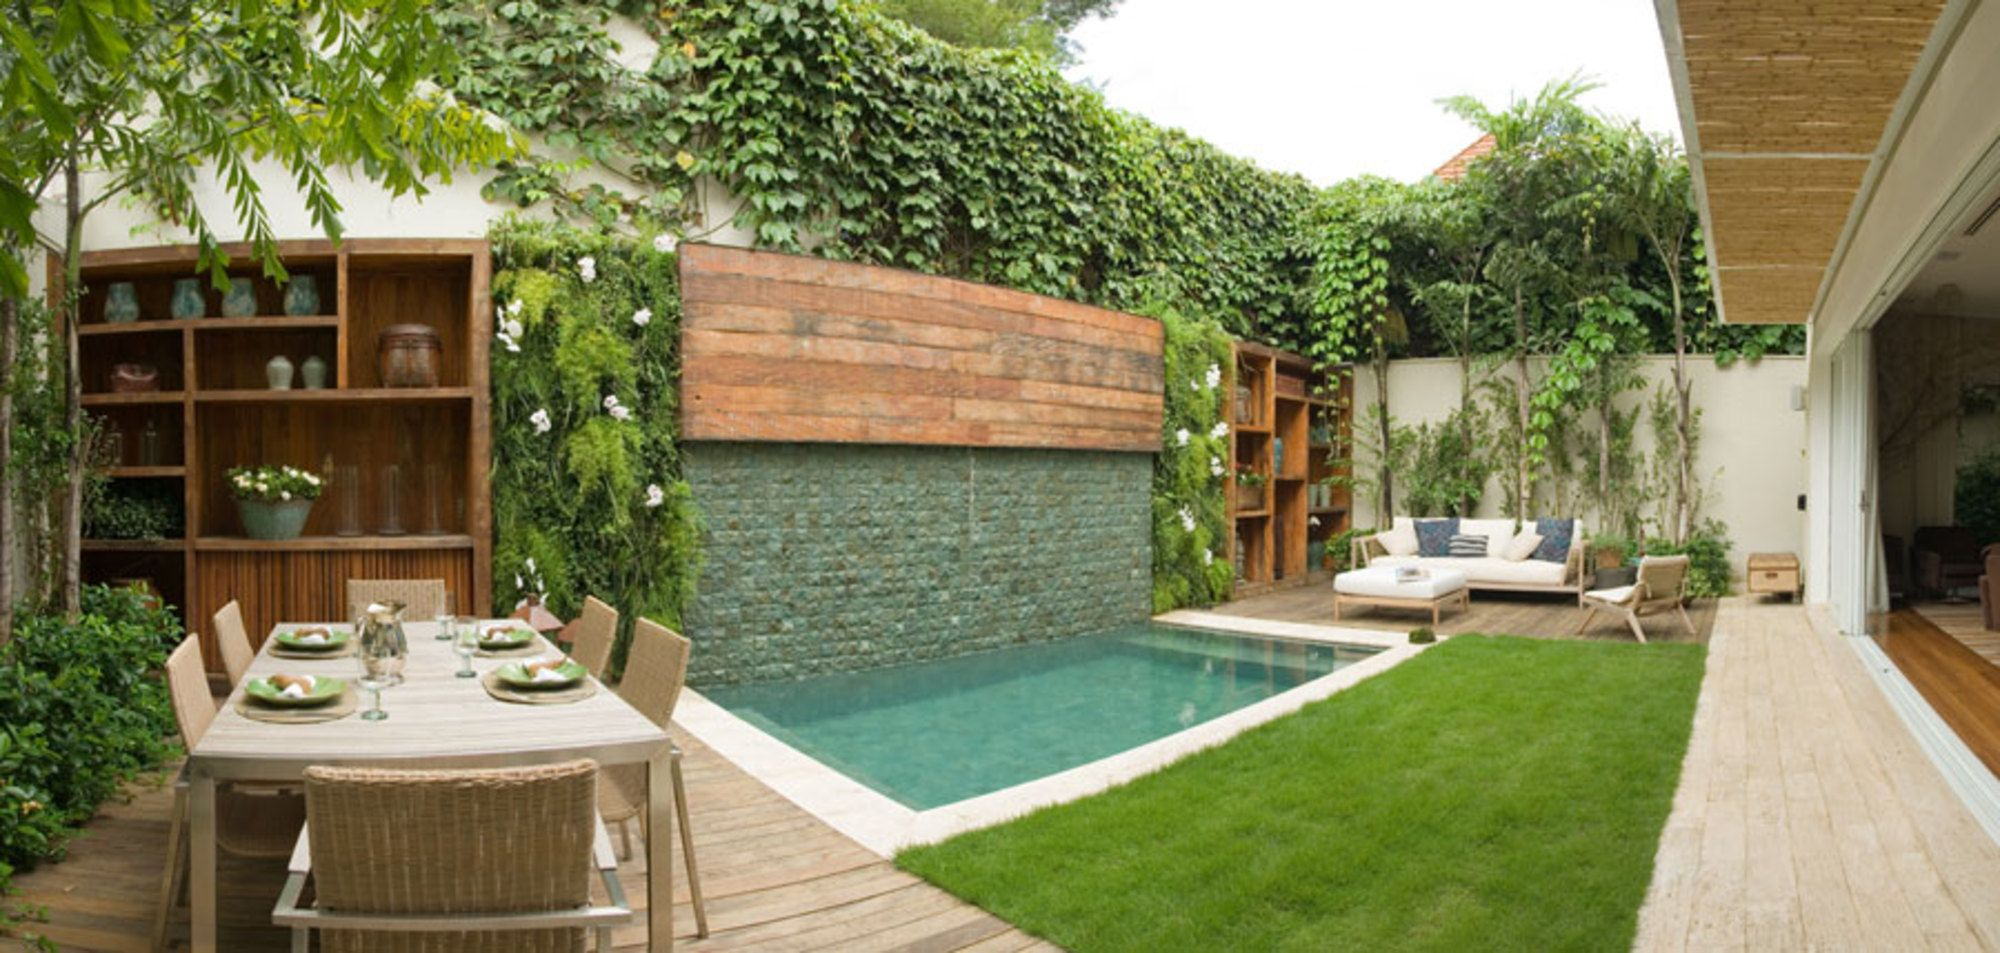 Jardins com piscinas pequenas buscar con google for Piscinas para casas pequenas